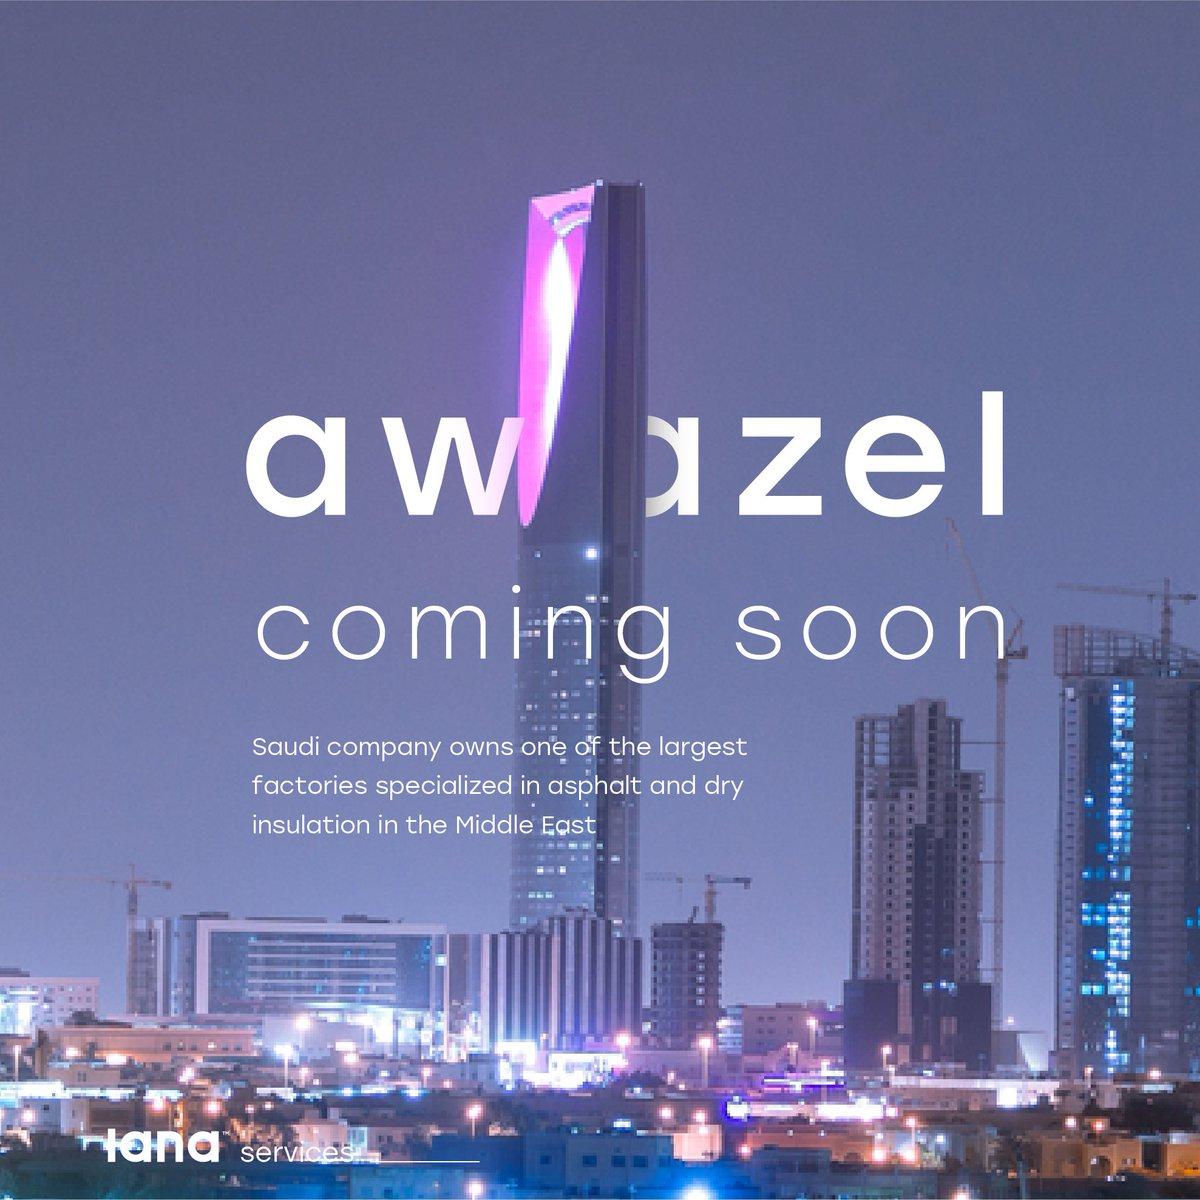 awazel hashtag on Twitter